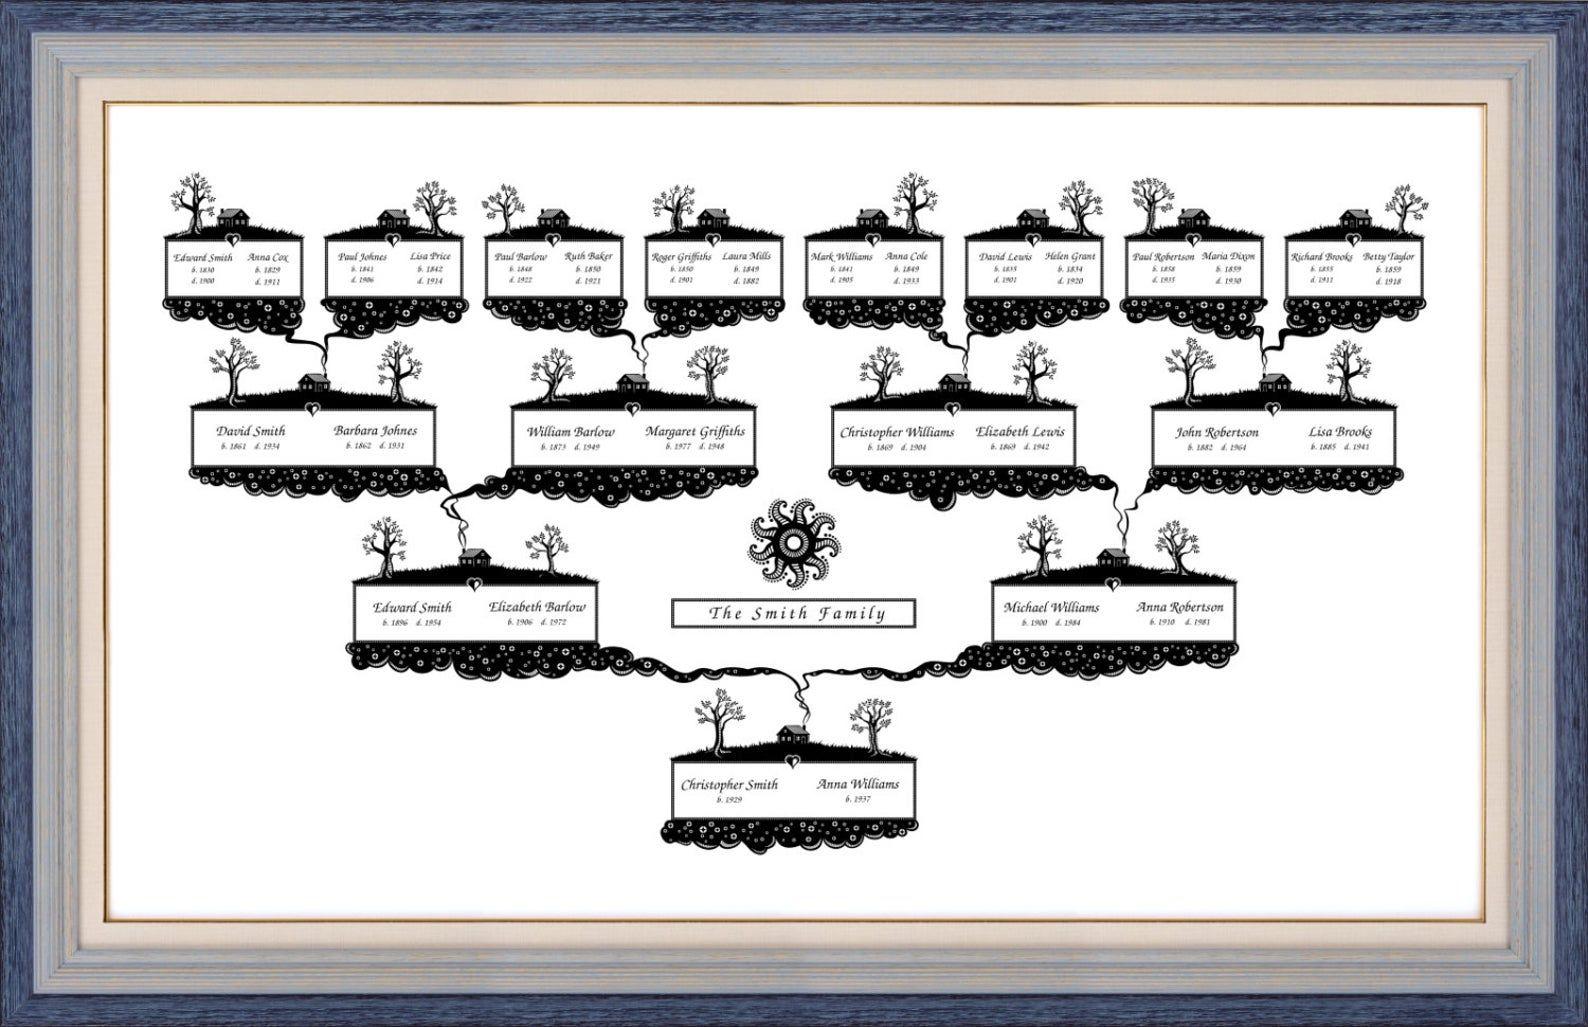 Stammbaum Diagramm Vorlage Mit Leerzeichen Digitale Datei Etsy In 2020 Family Tree Chart Proud Mom Quotes Little Brother Quotes